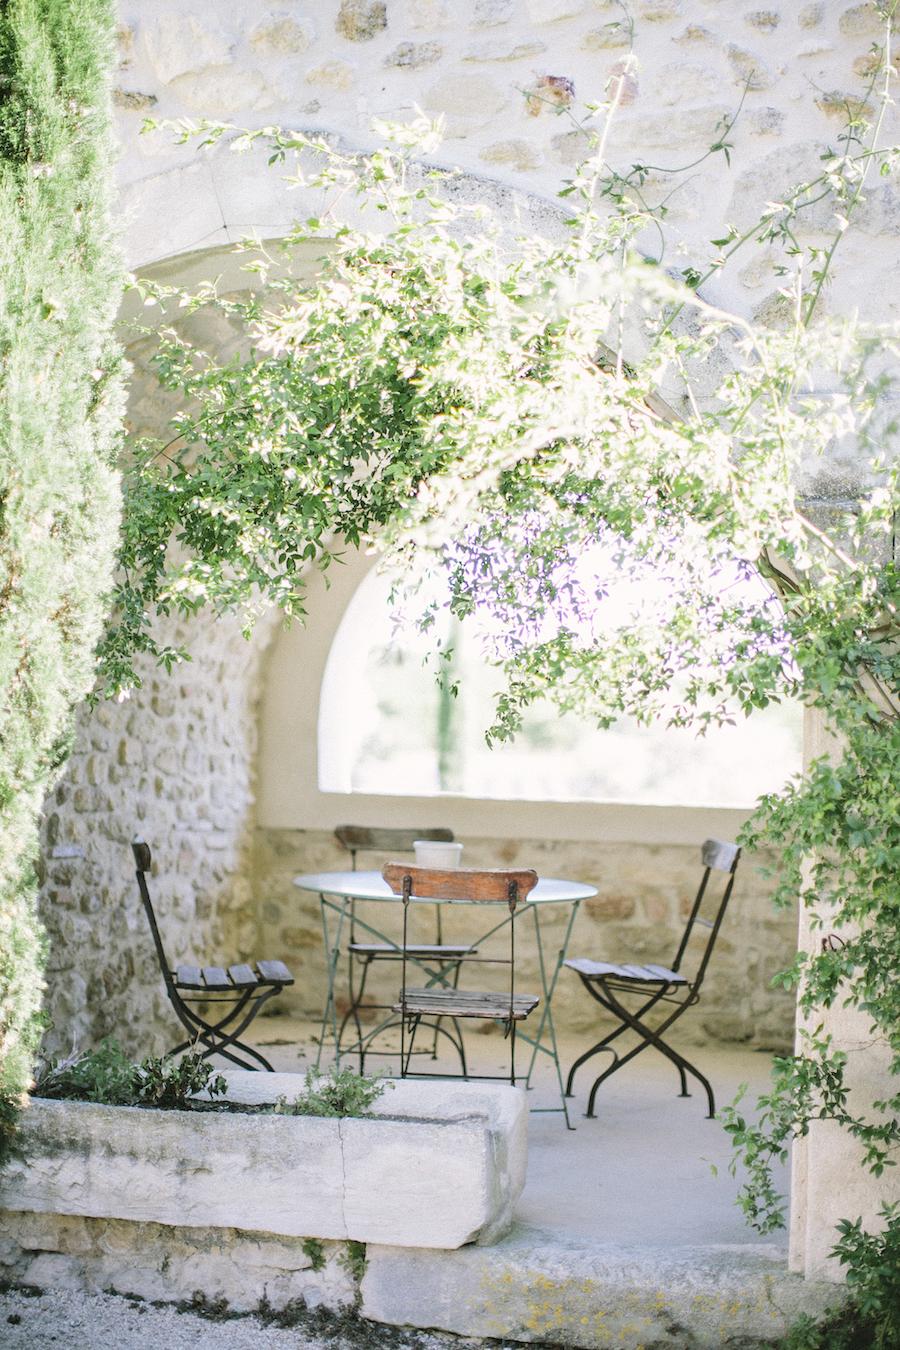 saya-photography-rustic-french-wedding-provence-domaines-de-patras-5.jpg